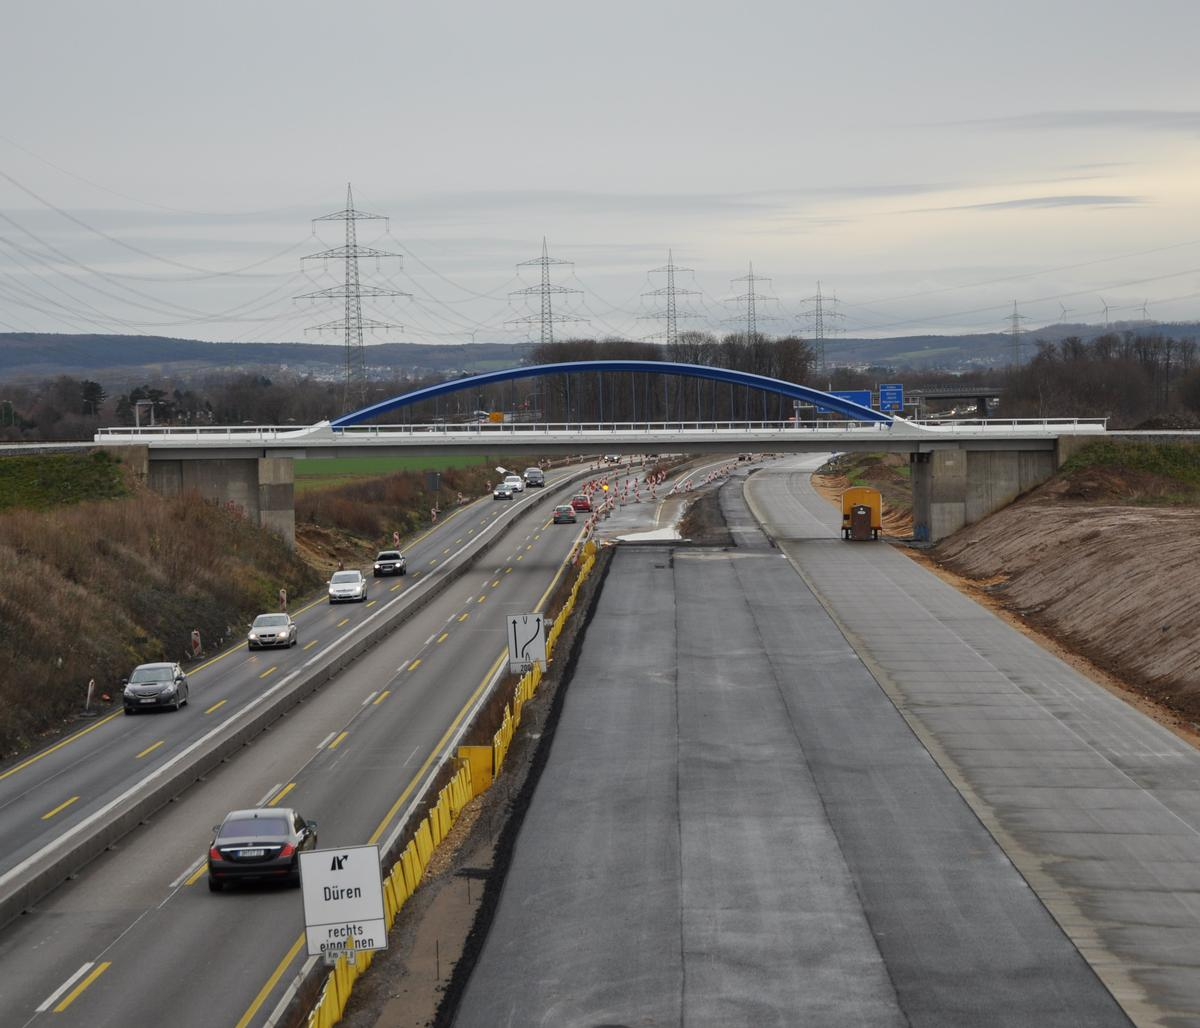 Railroad Bridge across the A 4 Motorway